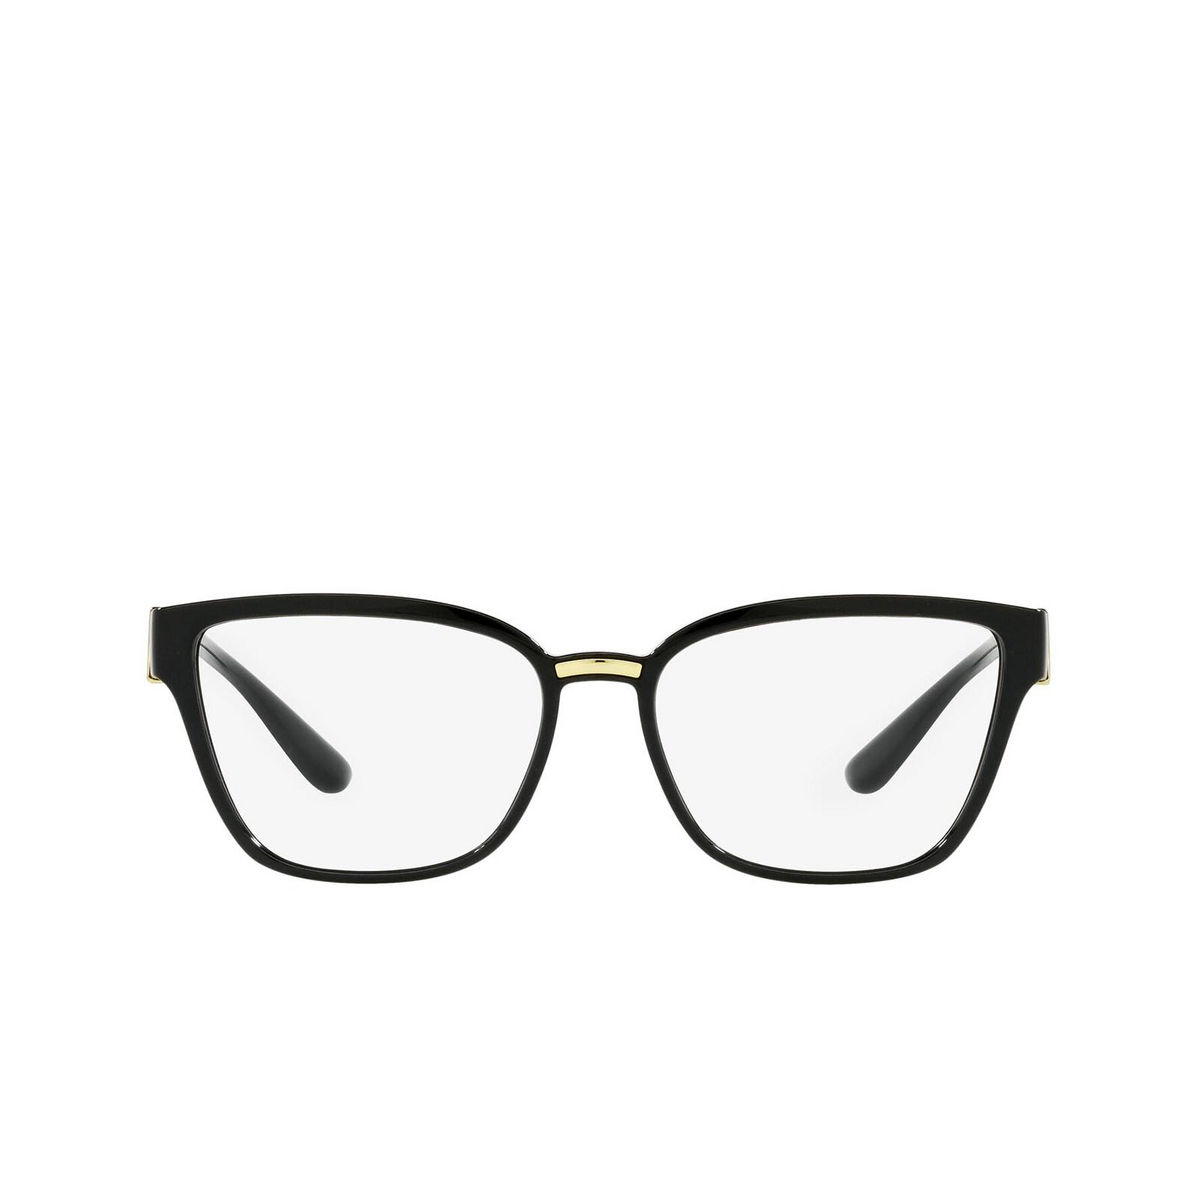 Dolce & Gabbana® Cat-eye Eyeglasses: DG5070 color Black 501 - front view.